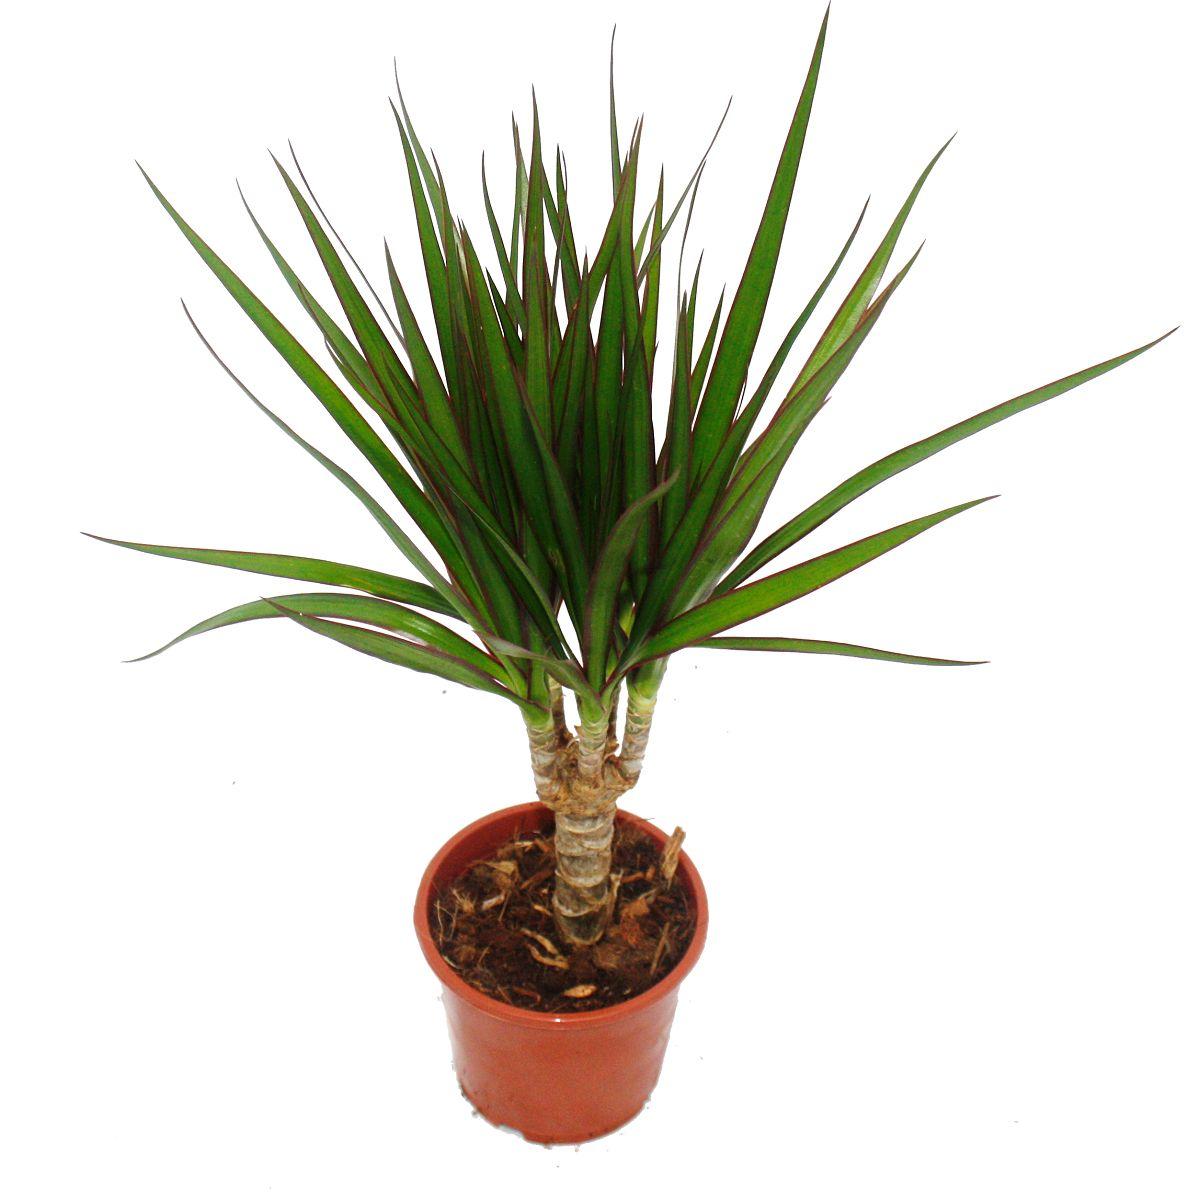 drachenbaum dracaena marginata 1 pflanze. Black Bedroom Furniture Sets. Home Design Ideas